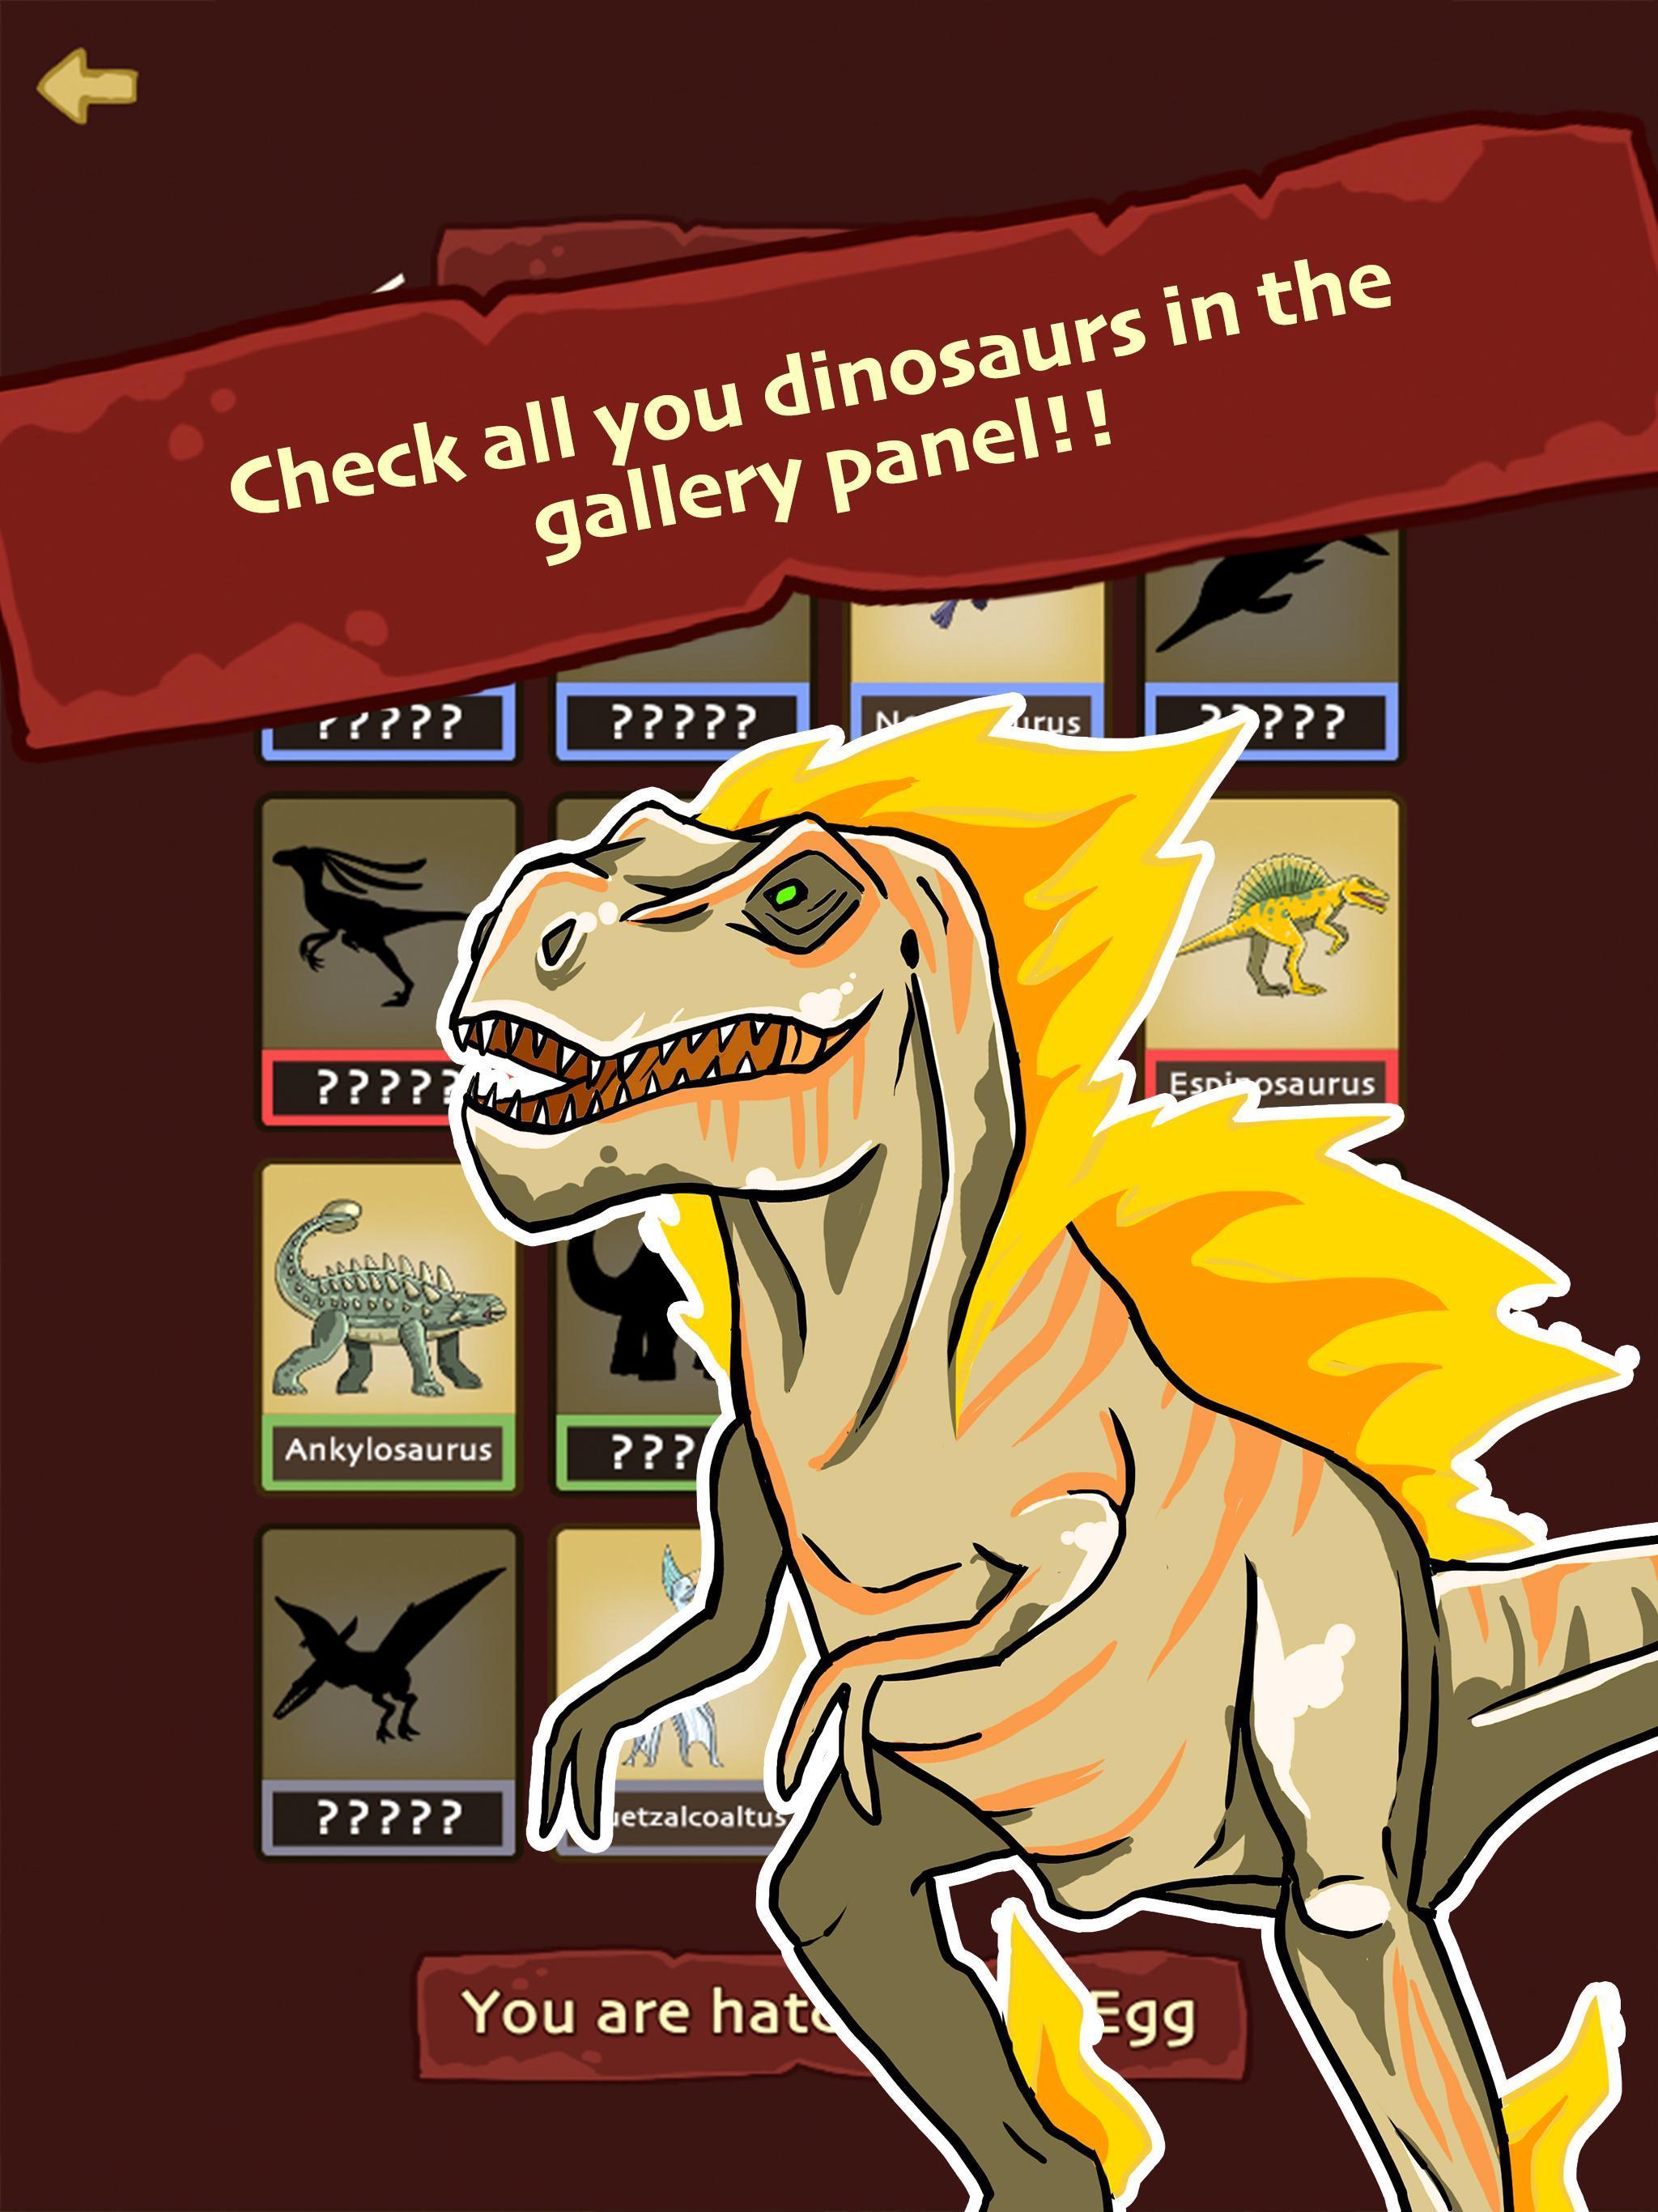 Hatch Dinosaur Eggs - Jurassic World Clicker Games 1.0.7 Screenshot 15